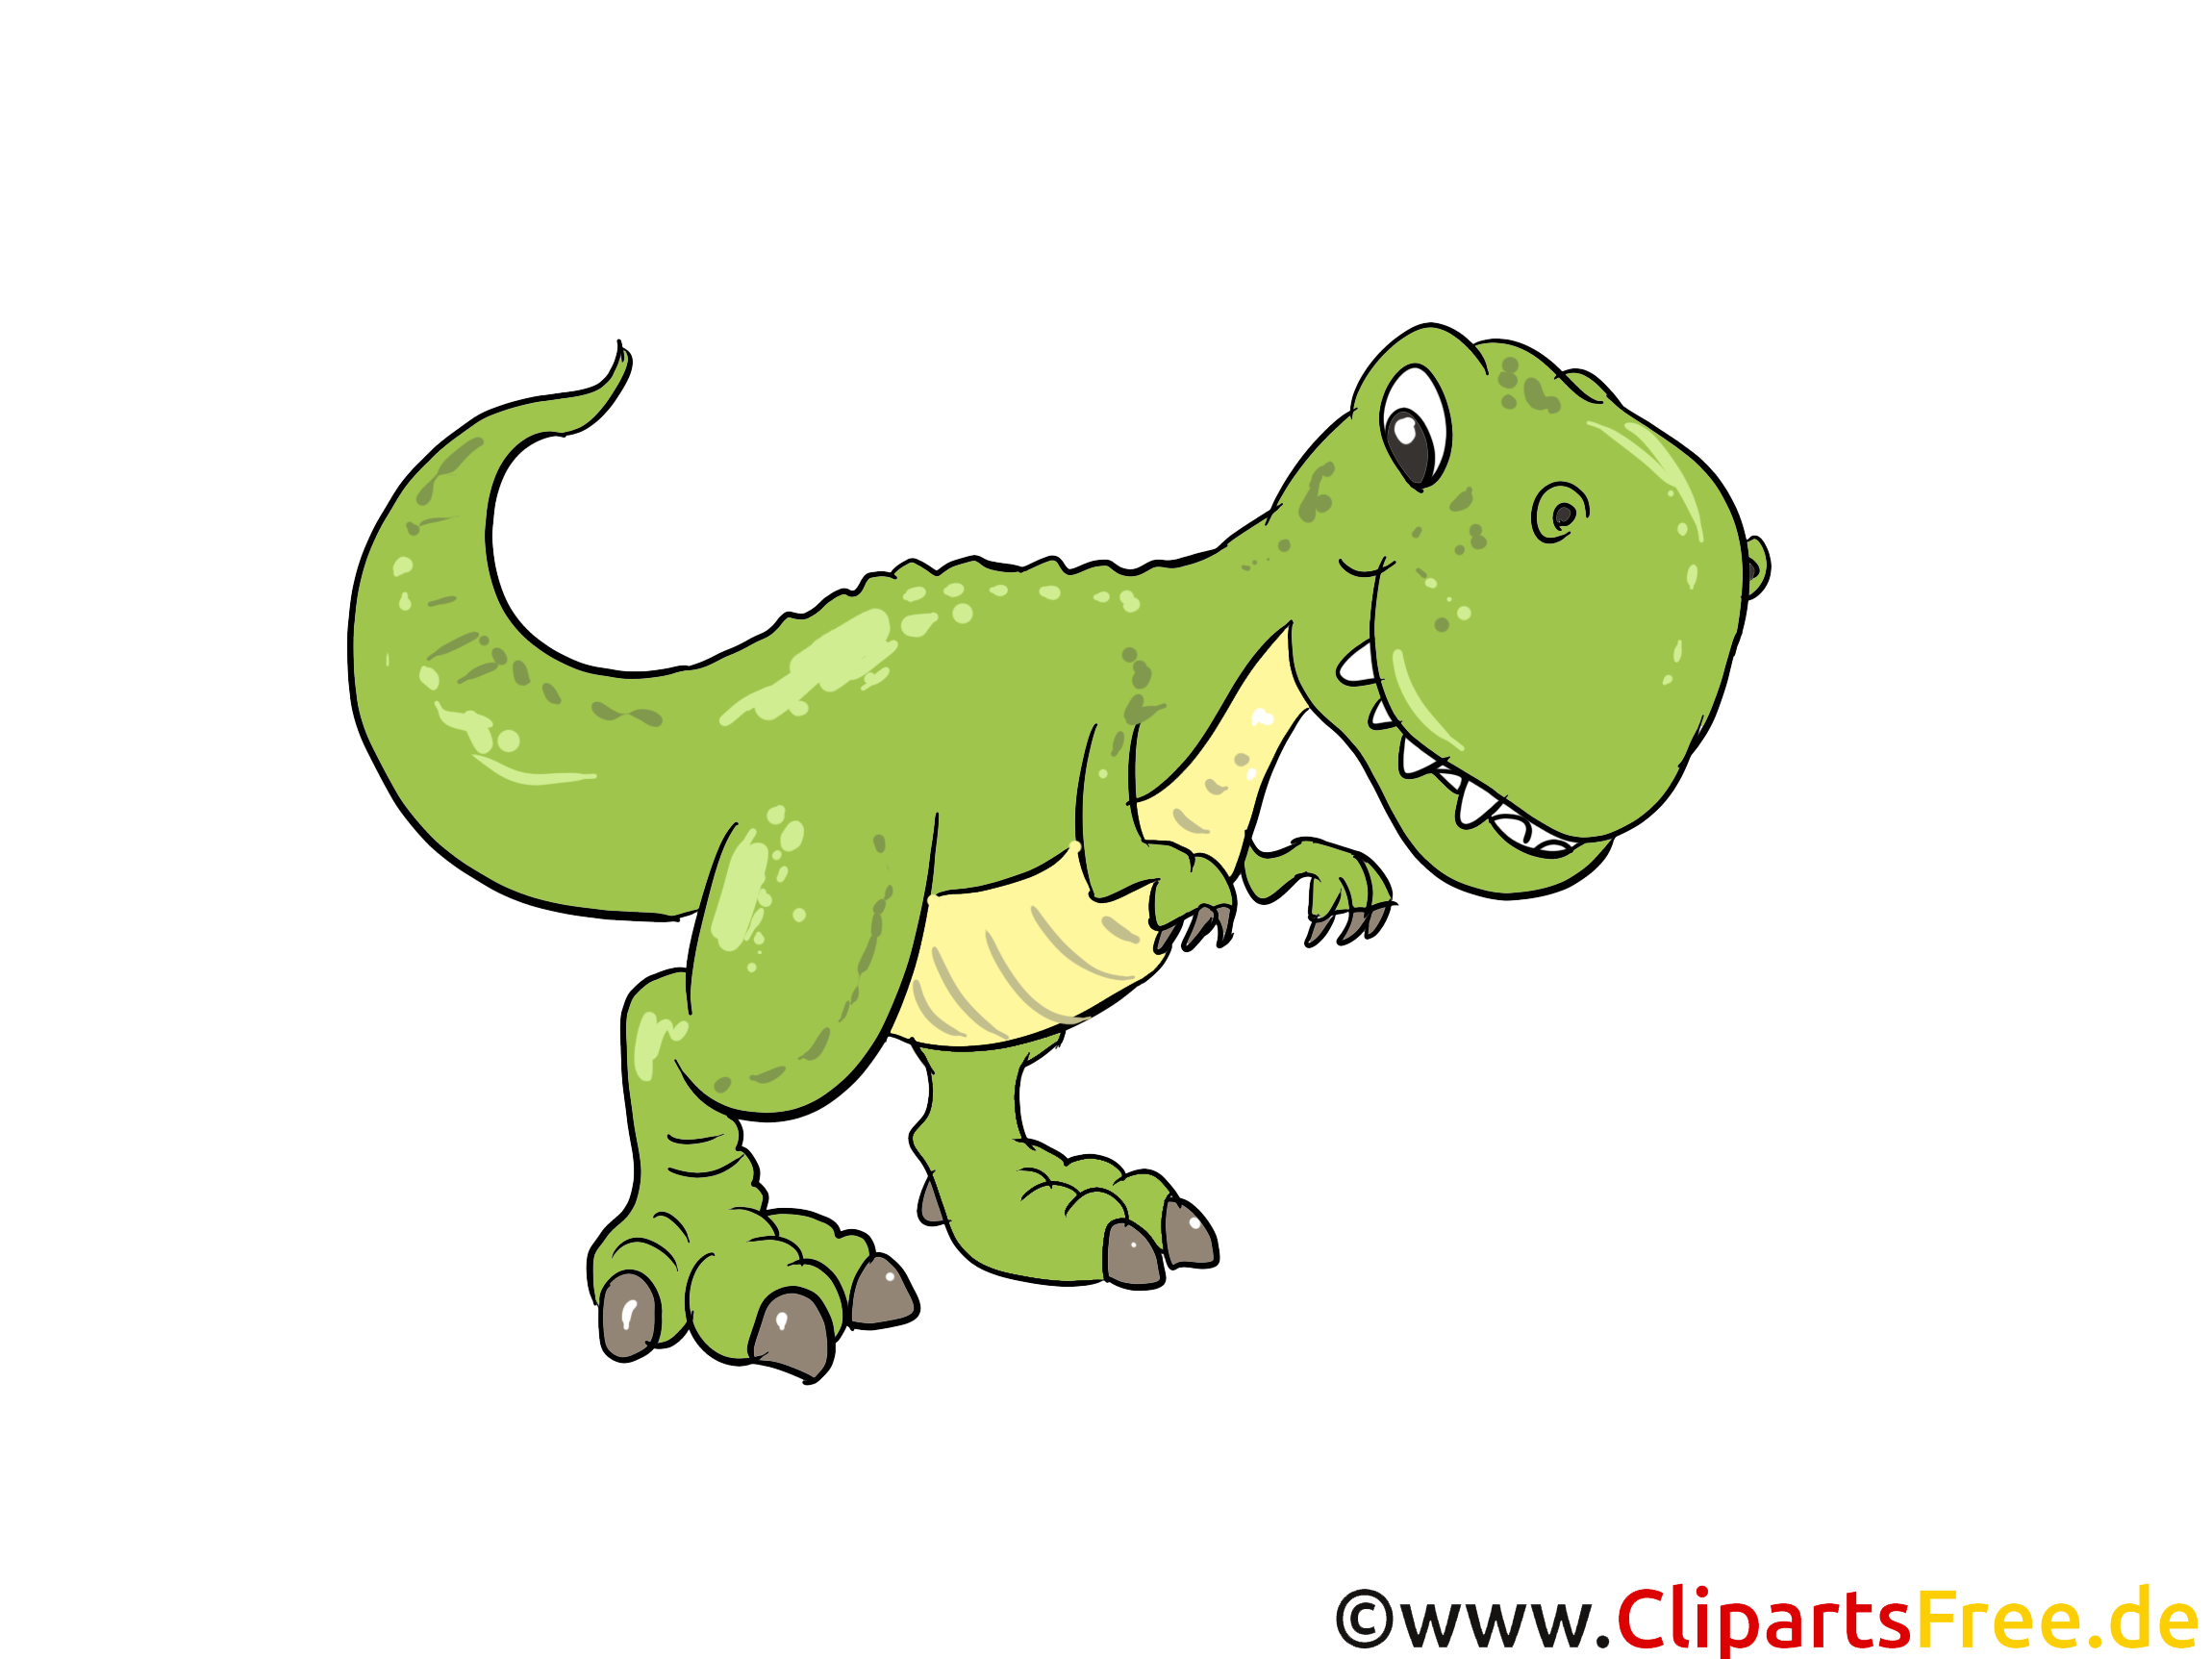 Tyrannosaurus Rex Clipart Bild Cartoon Comic Illustration Gratis